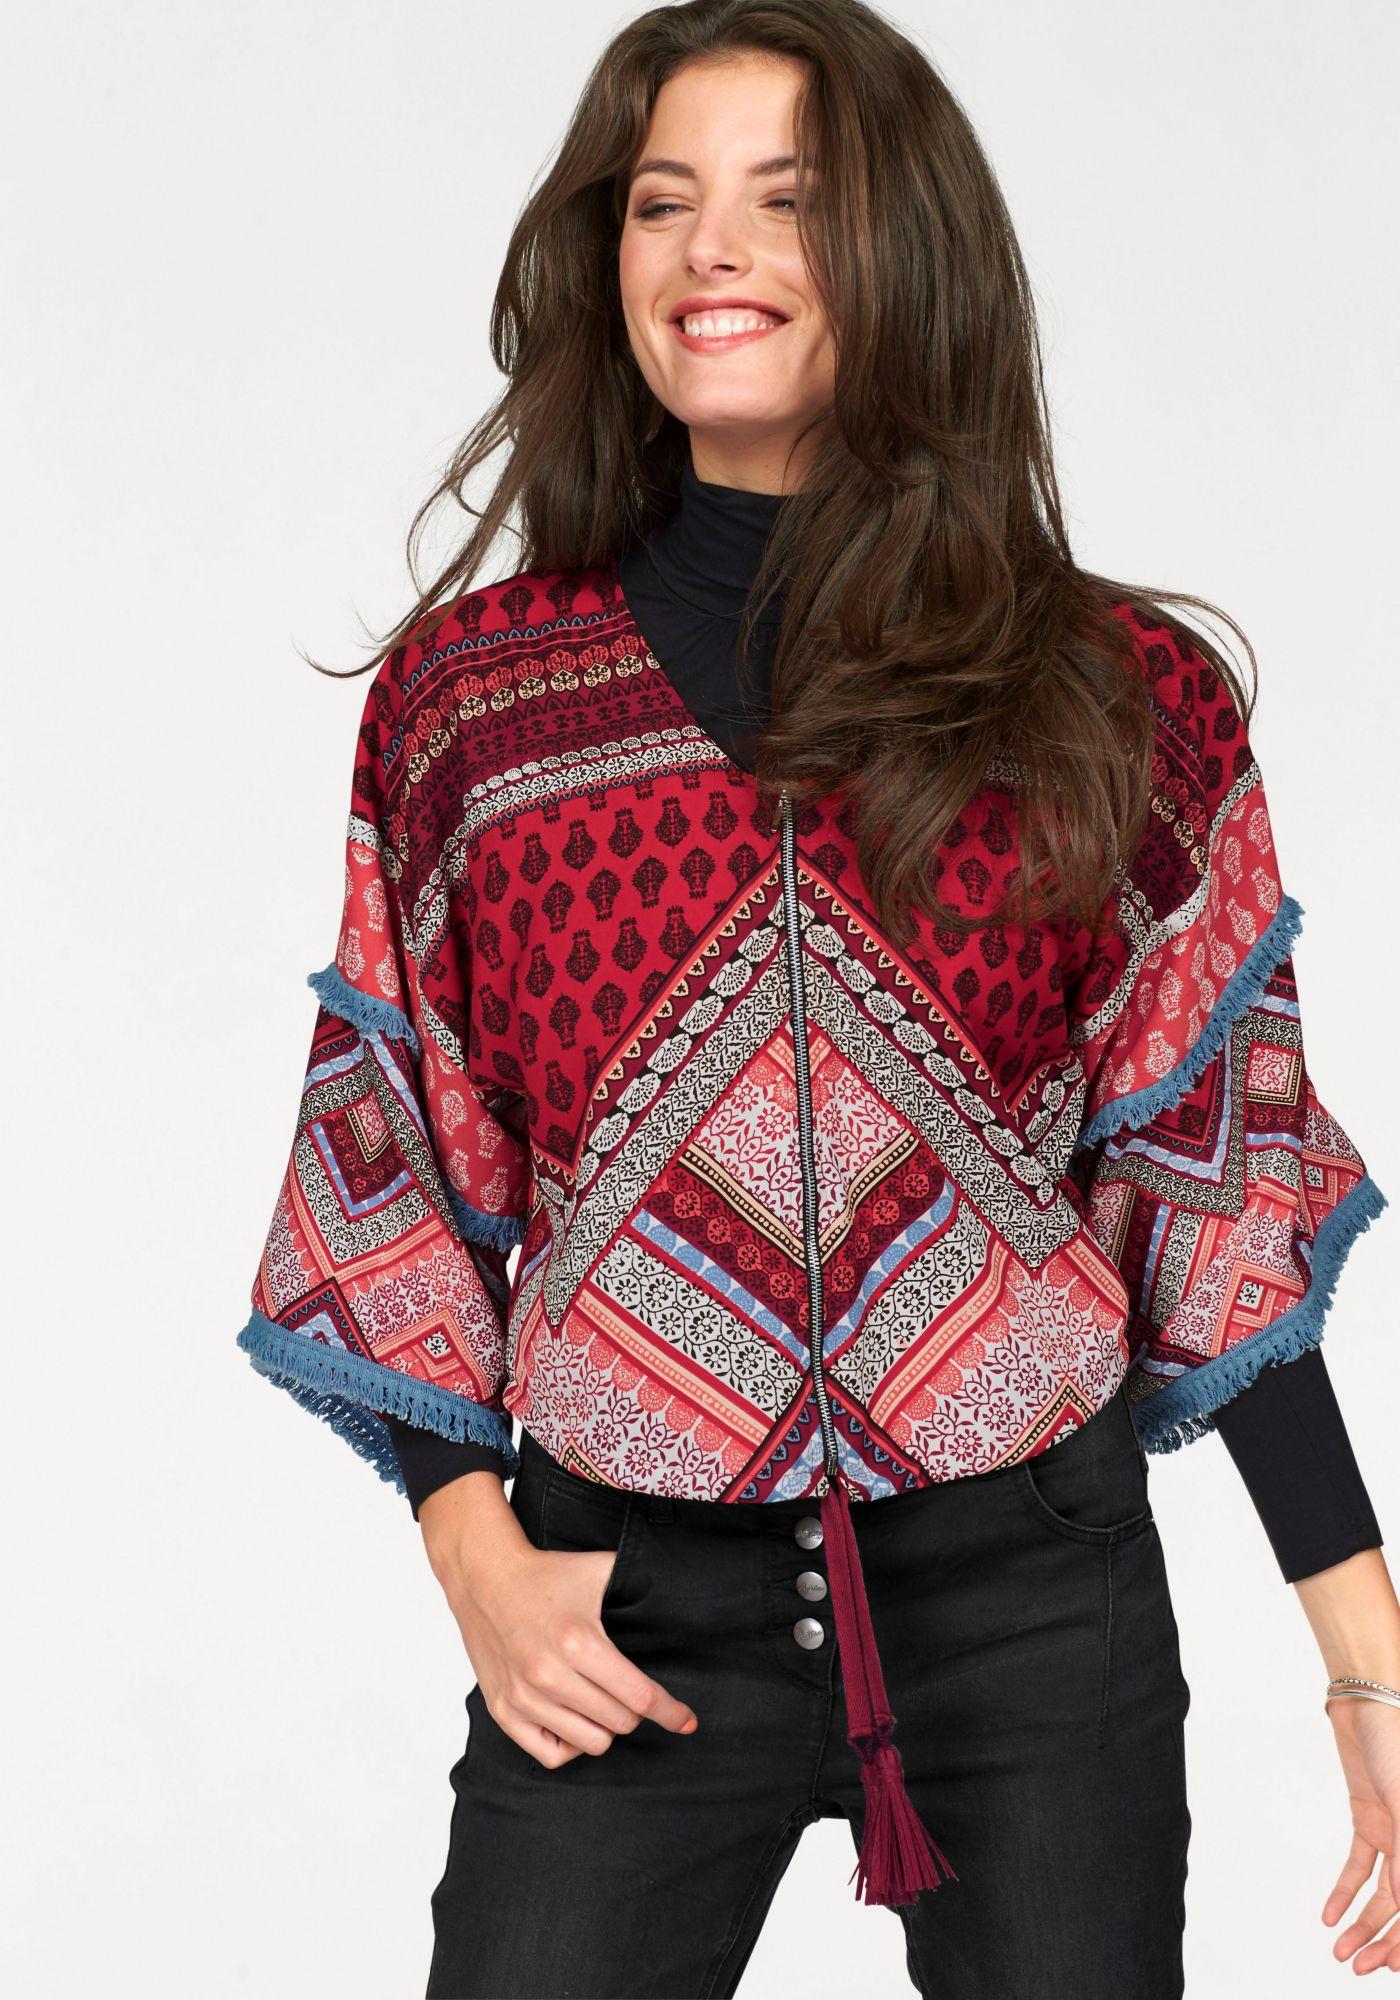 Kimono jacken im schwab online shop damen jacken - Kimono jacke damen ...